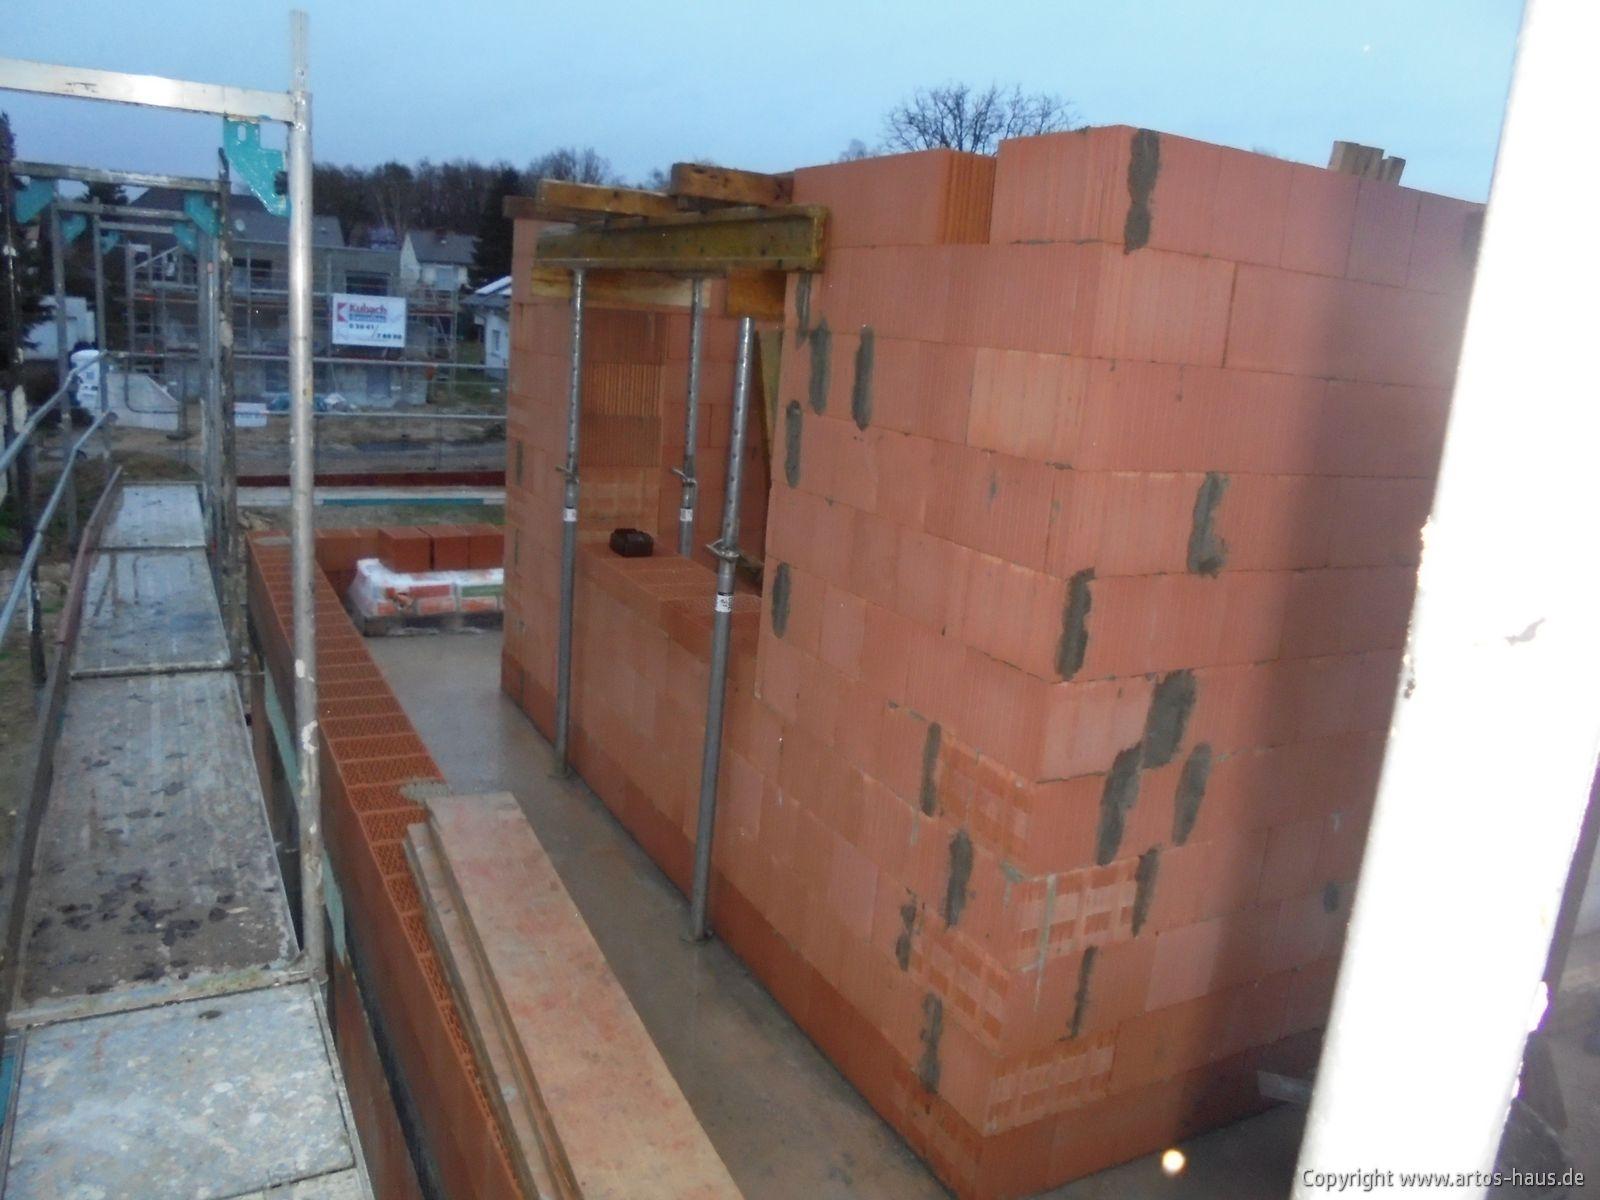 Rohbau der Baustelle in Bonn im Januar 2021 / ARTOS-HAUS Bild 7